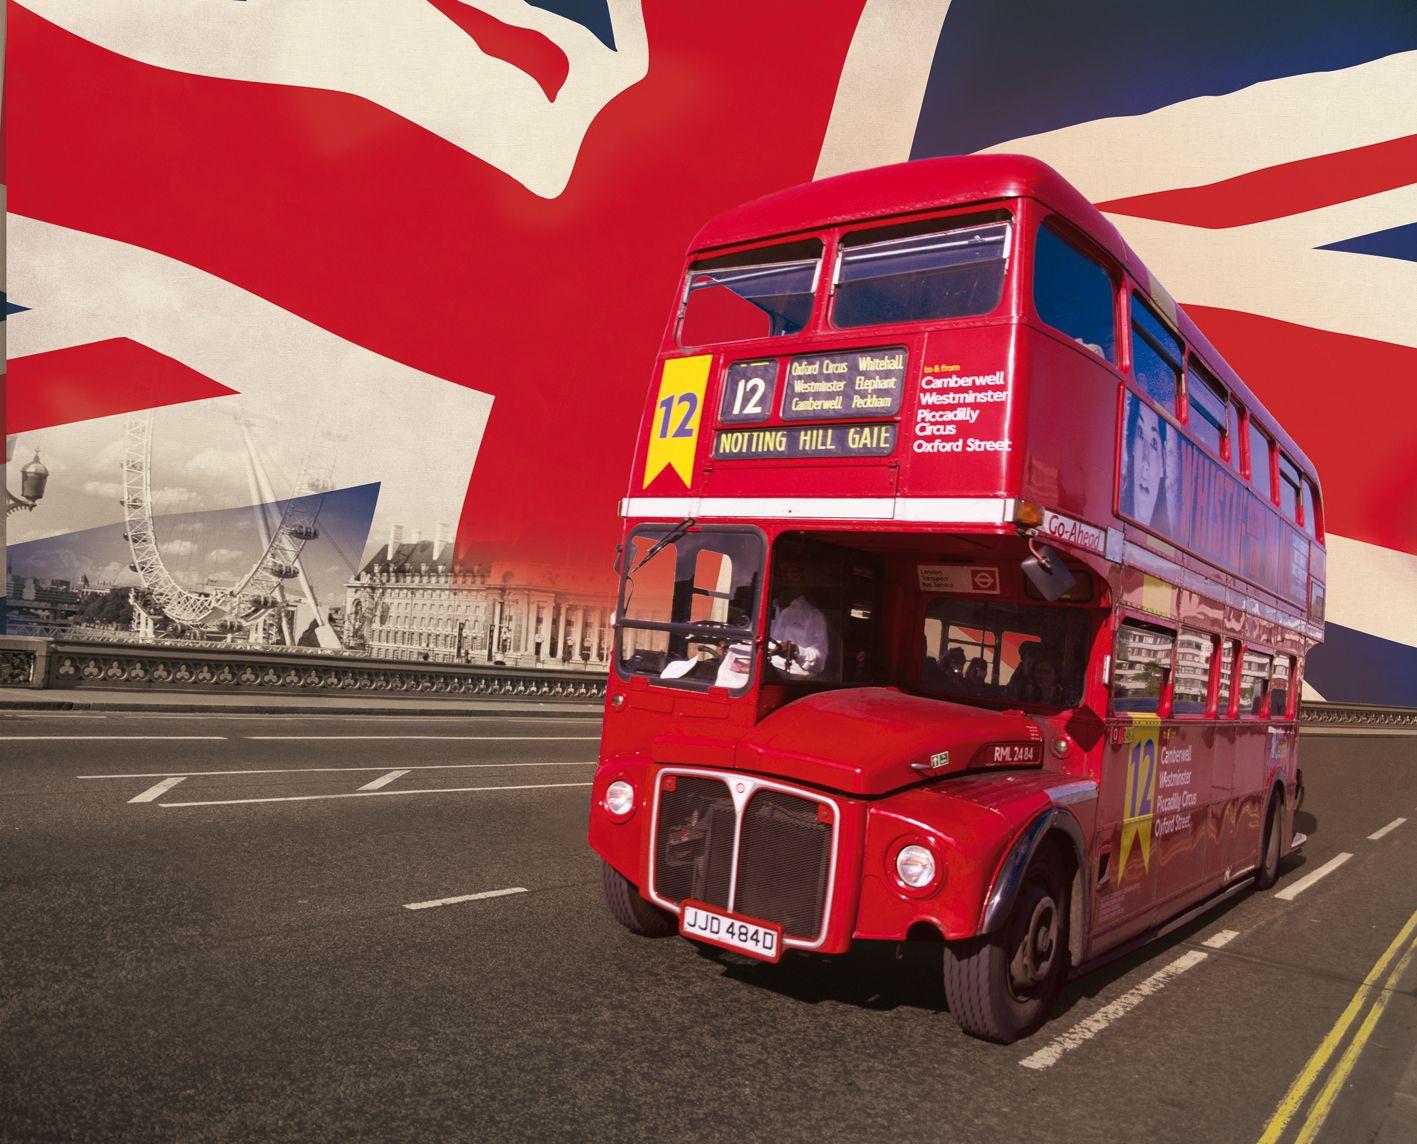 GIANT WALLPAPER WALL MURAL LONDON BUS UNION JACK THEME DESIGN 1417x1144